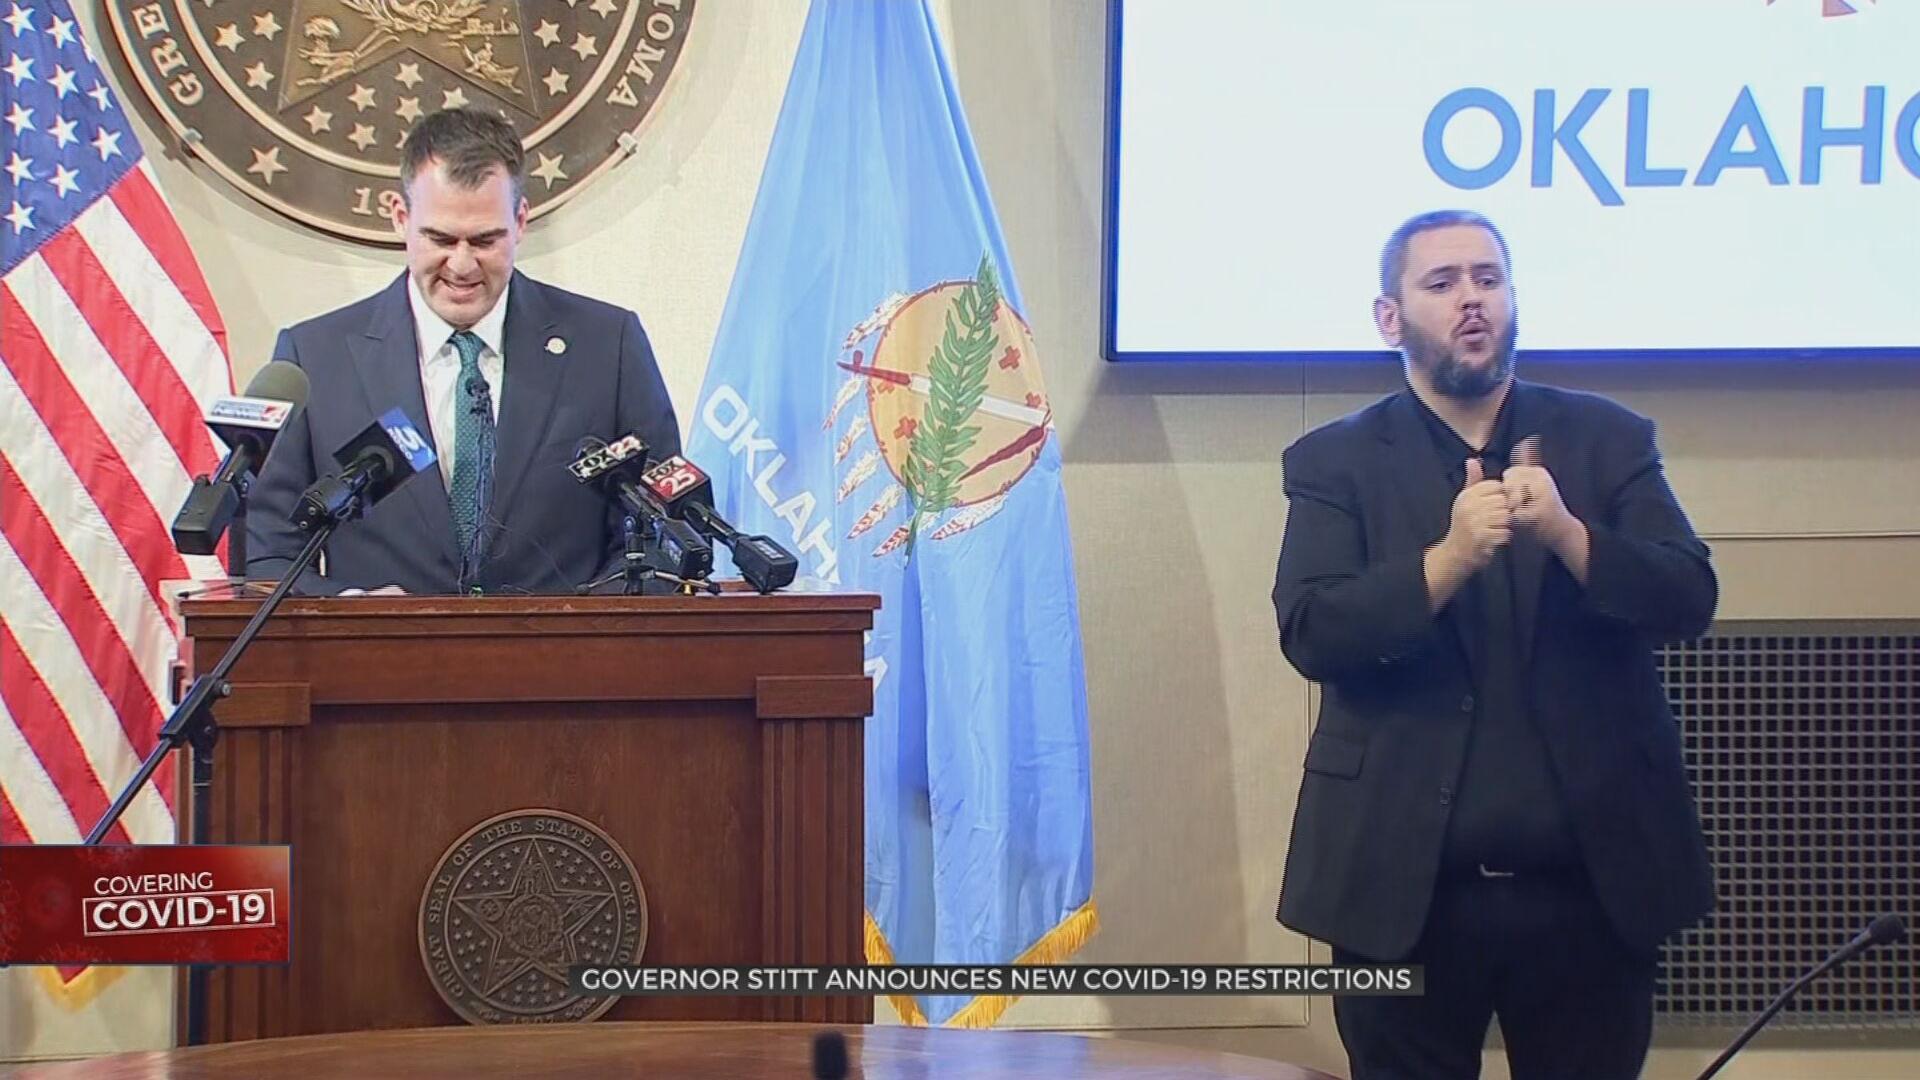 Gov. Stitt Urges Oklahomans To 'Do Their Part' To Ease Burden On Healthcare System